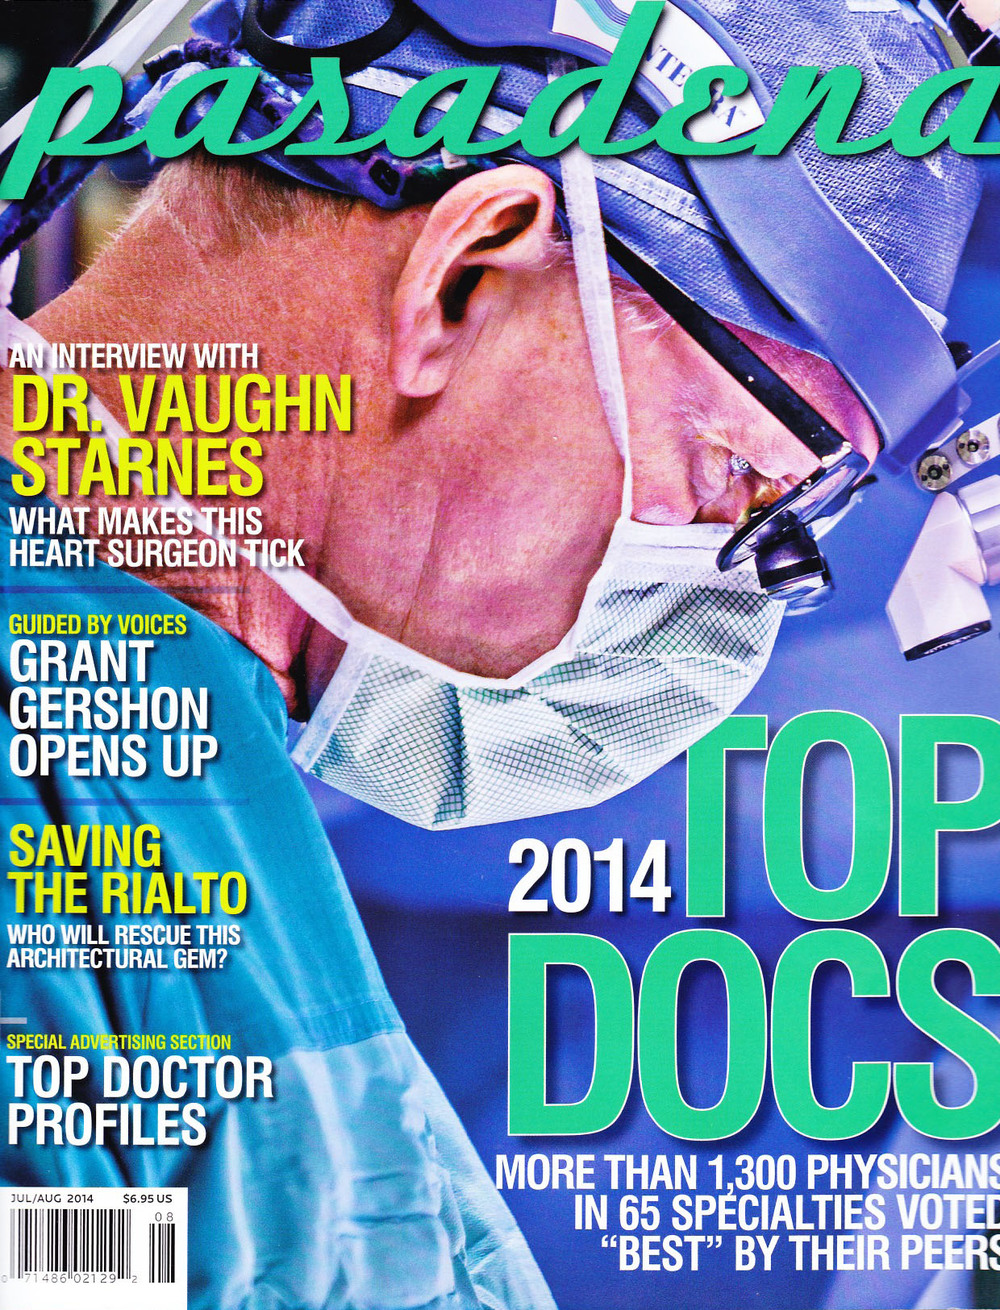 Pasadena Top Doctor.jpg